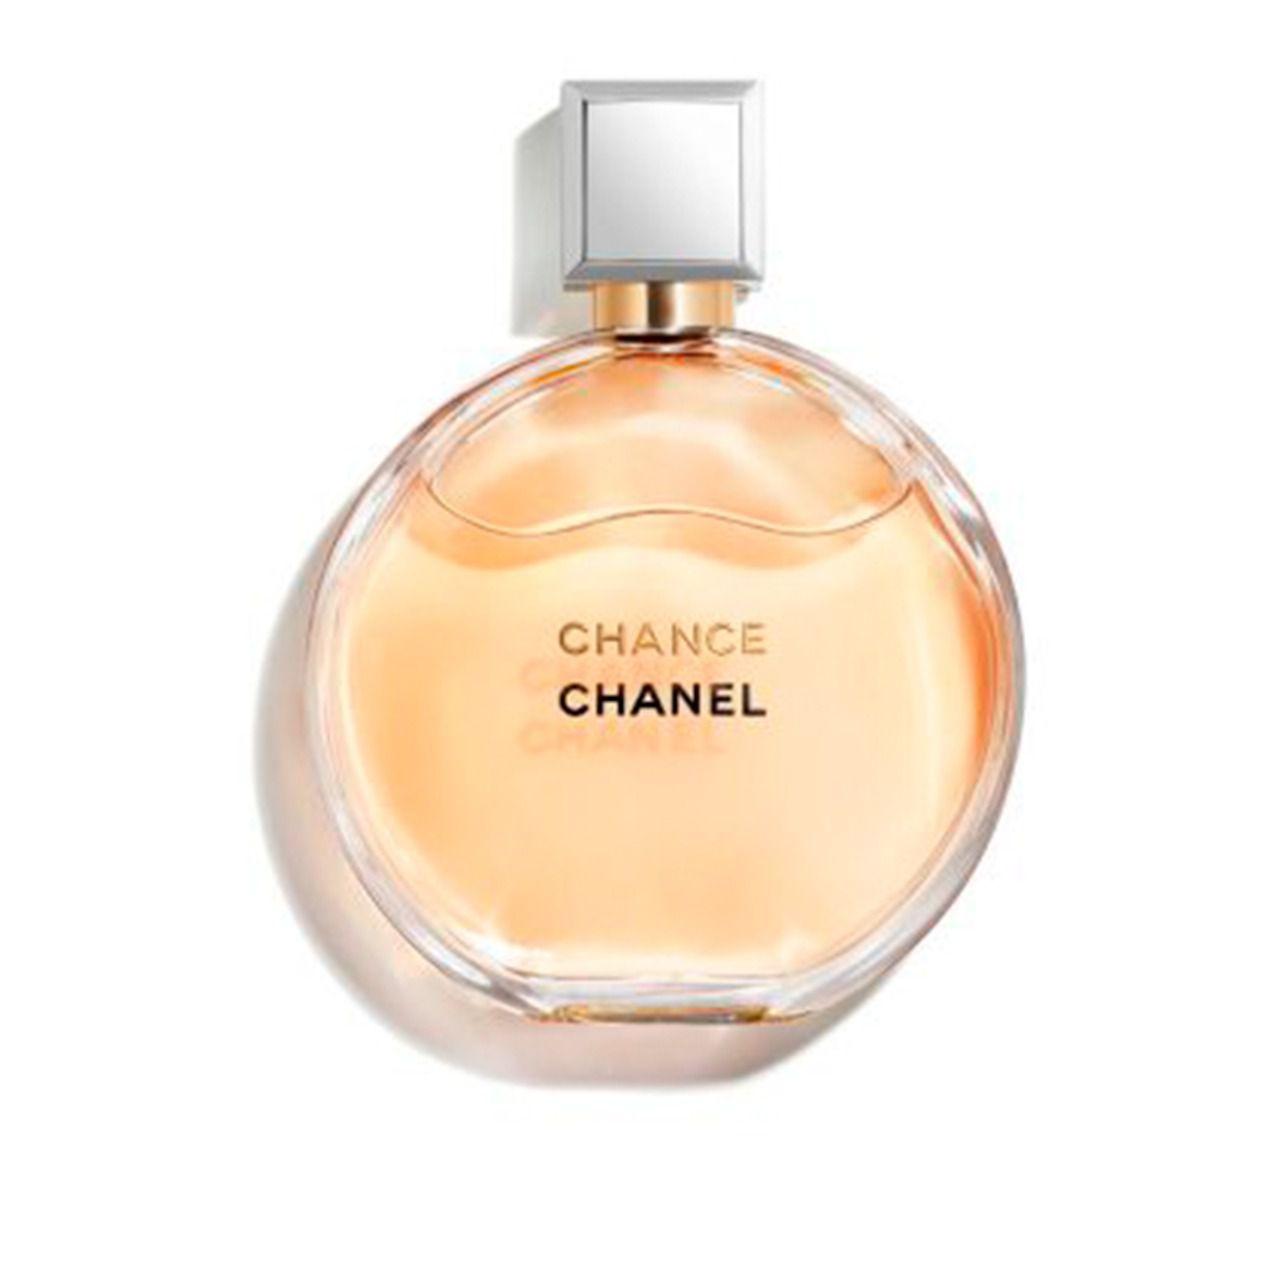 Chance Chanel Eau de Parfum Perfume Feminino